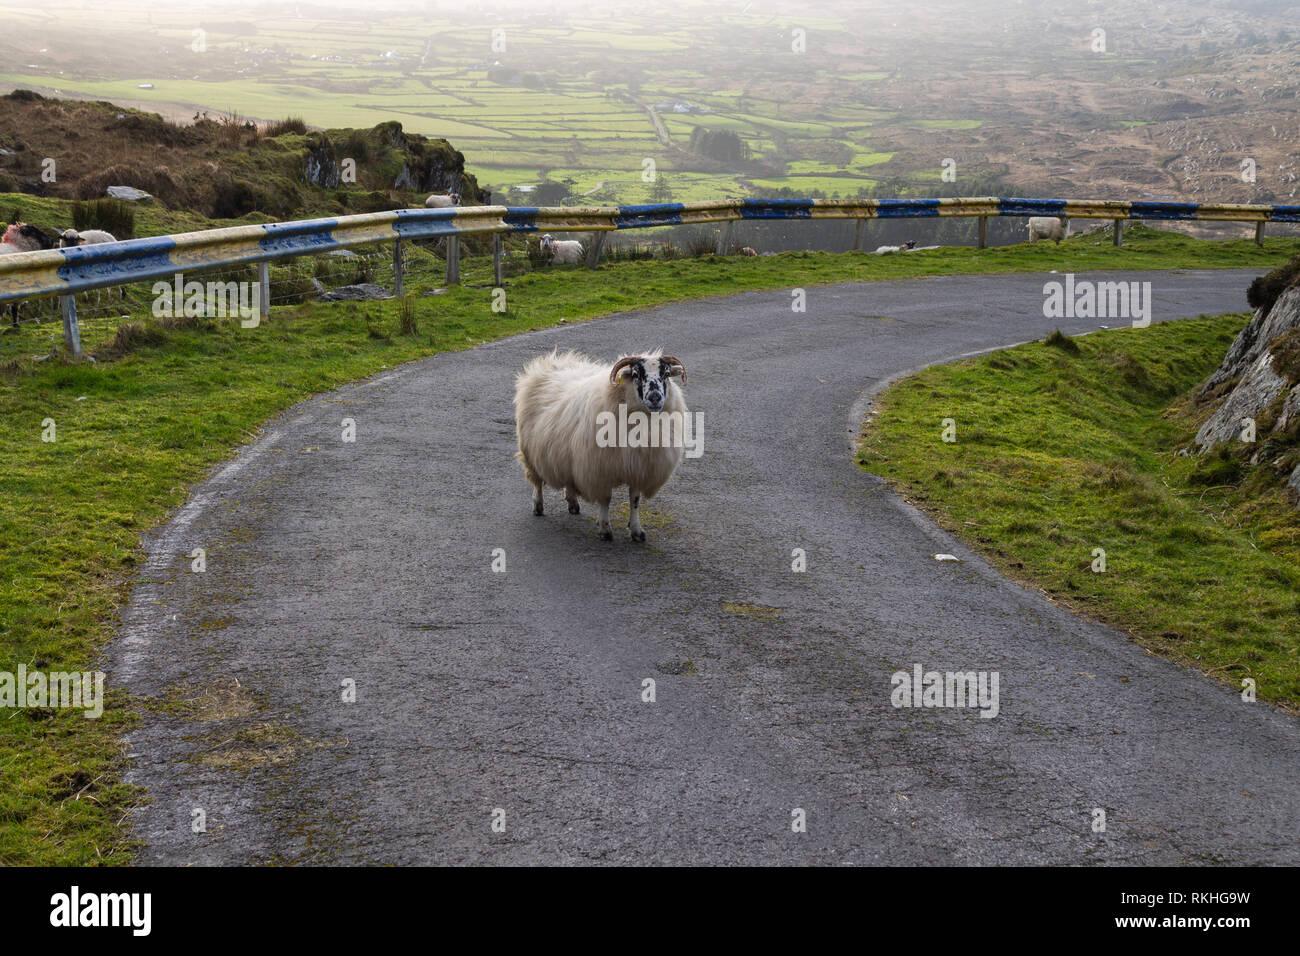 mixed-breed-ewe-blocking-a-road-on-a-mountain-side-in-ireland-RKHG9W.jpg